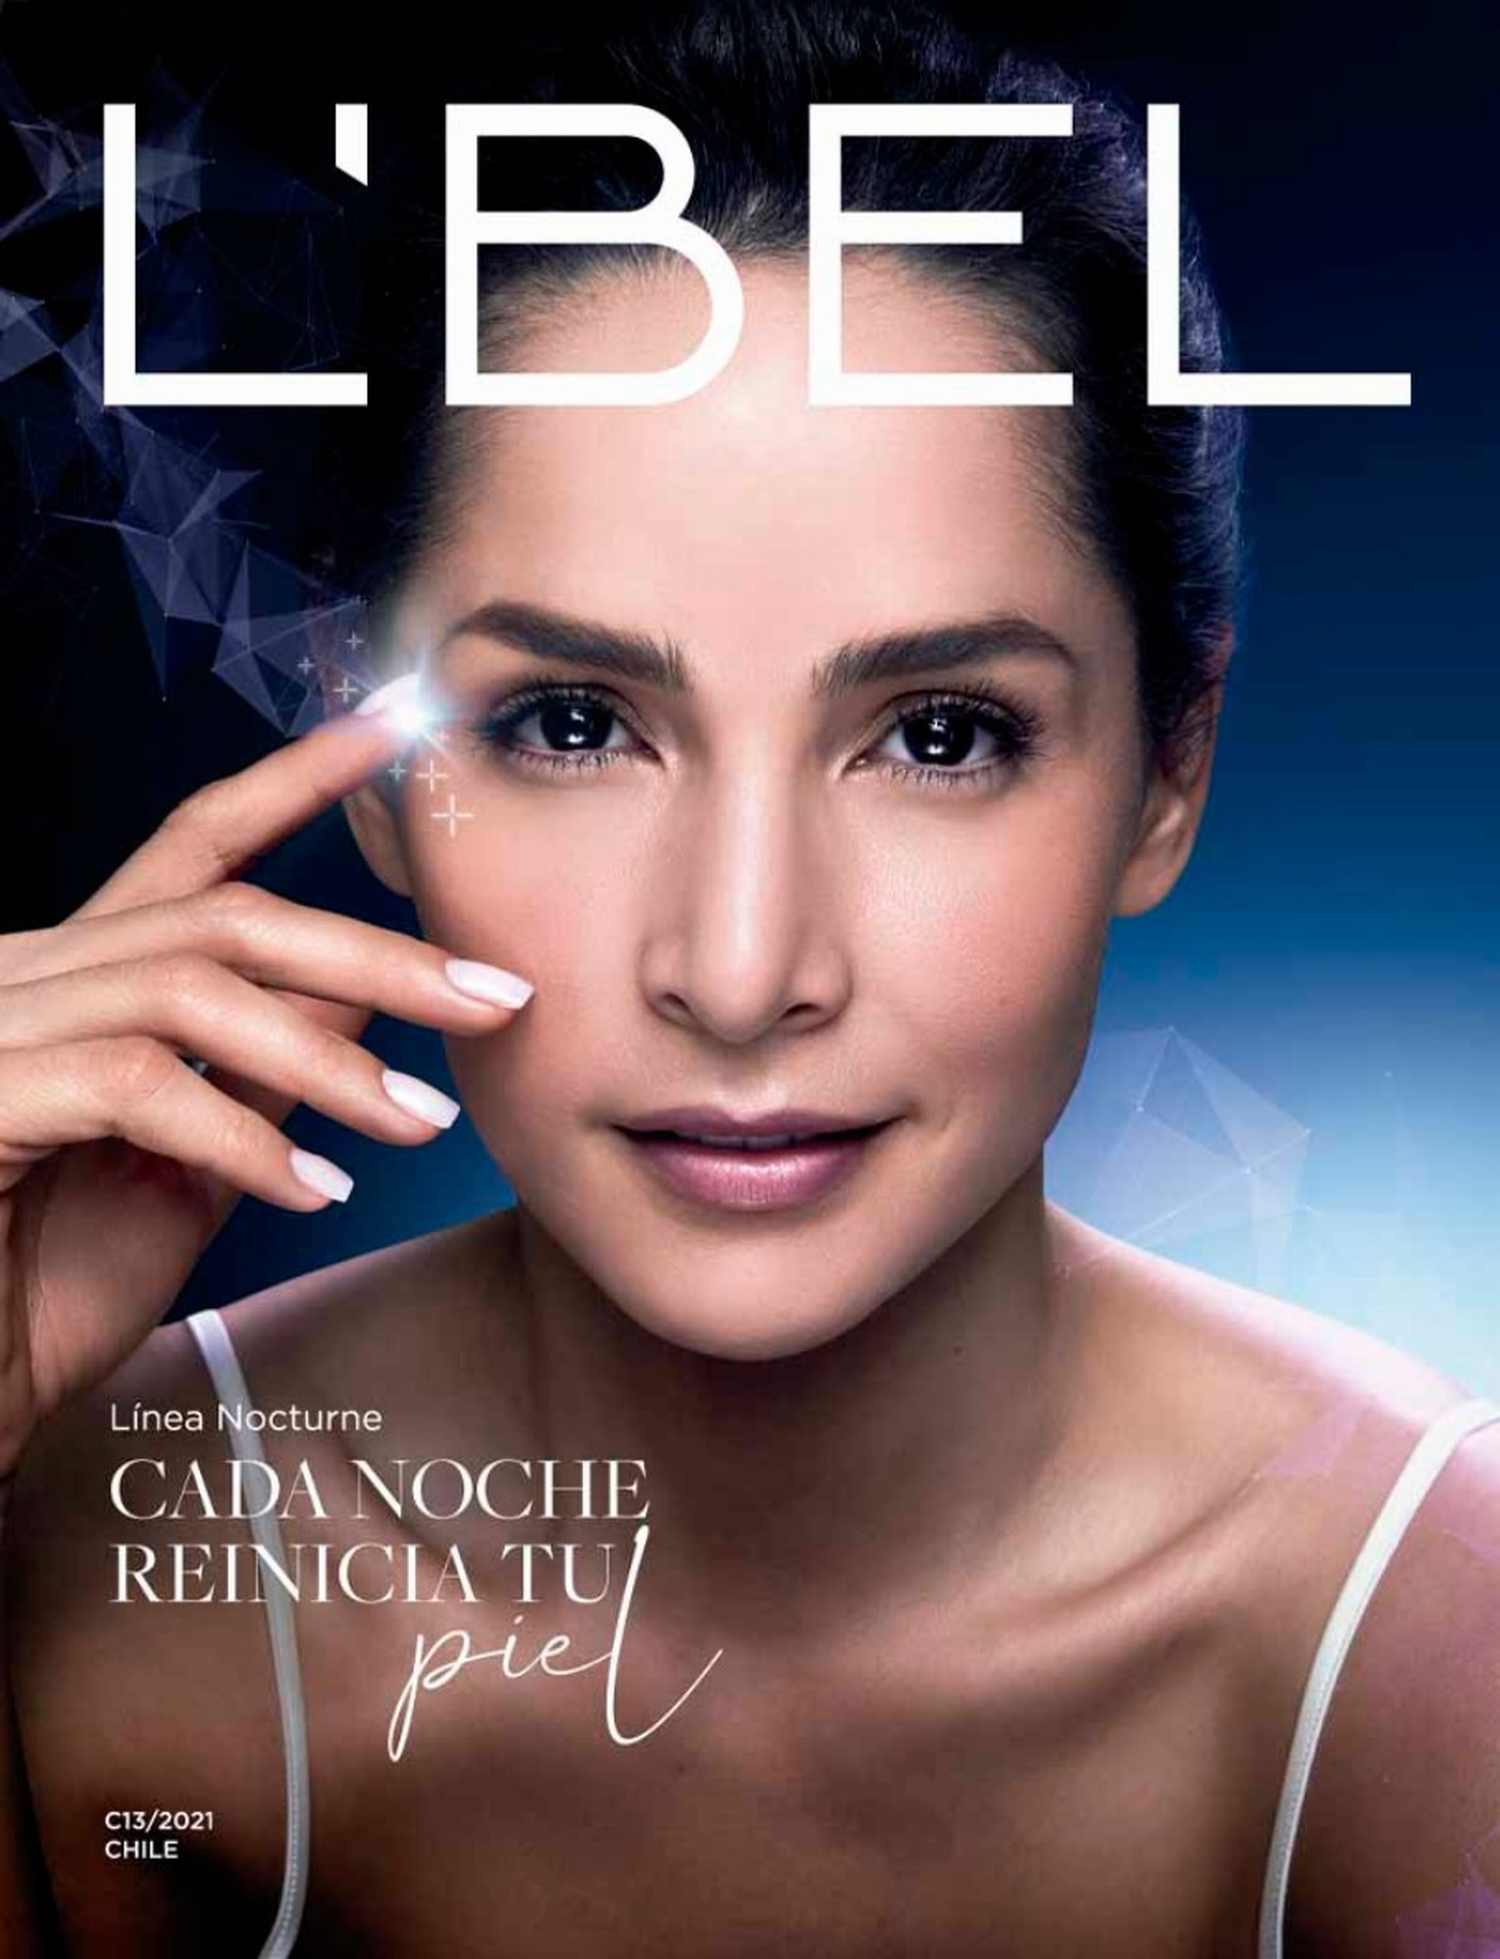 Catálogo L'Bel Campaña 13 2021 Chile